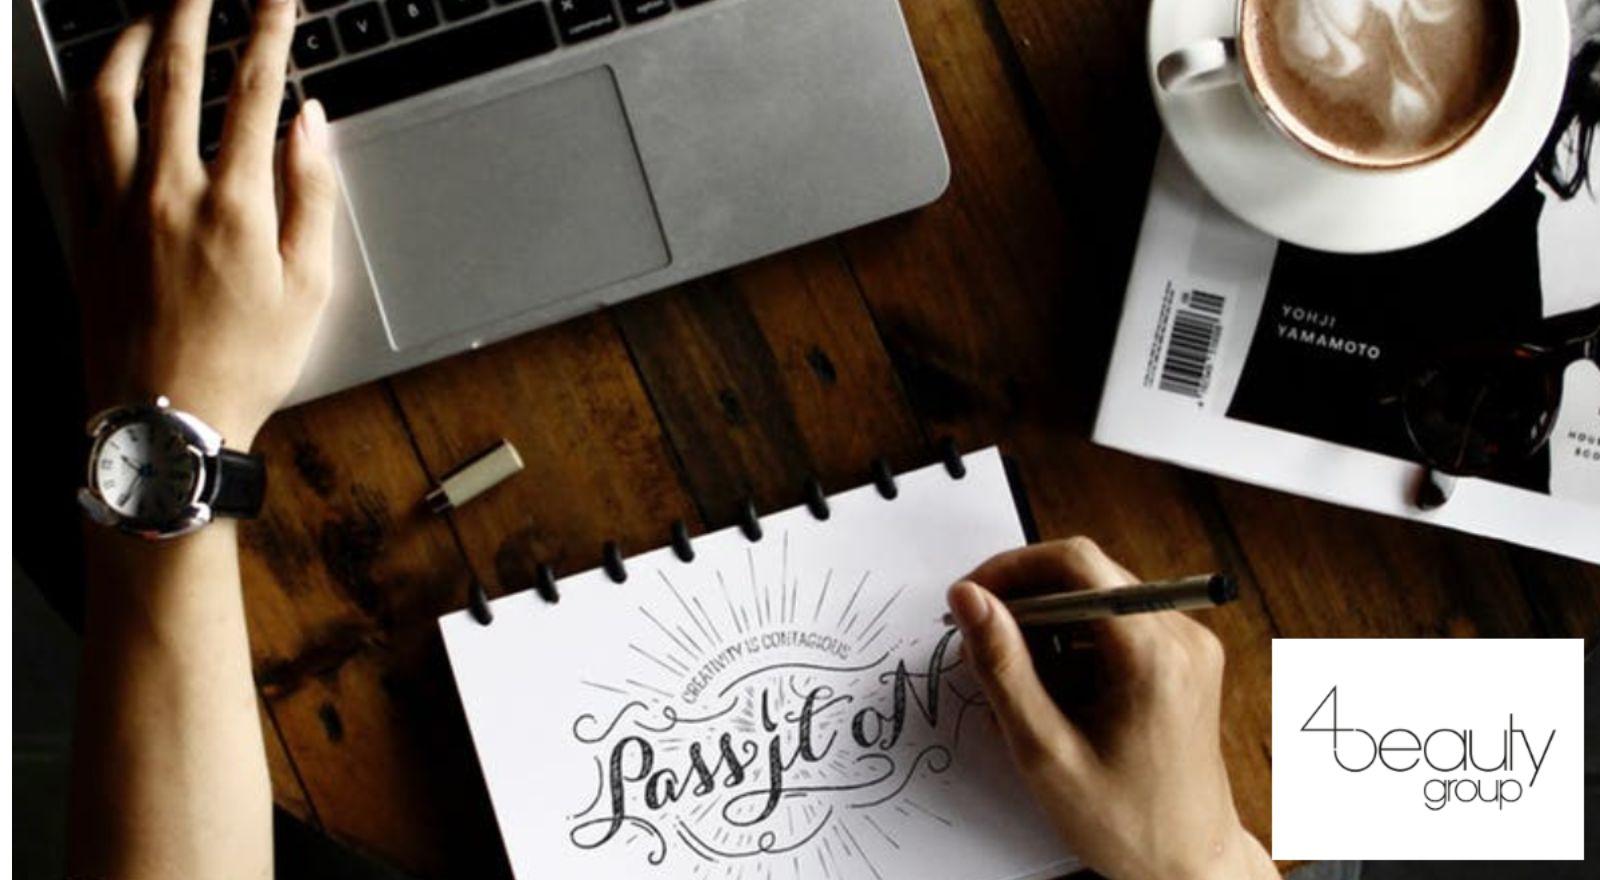 Digital Graphic Designer at undefined